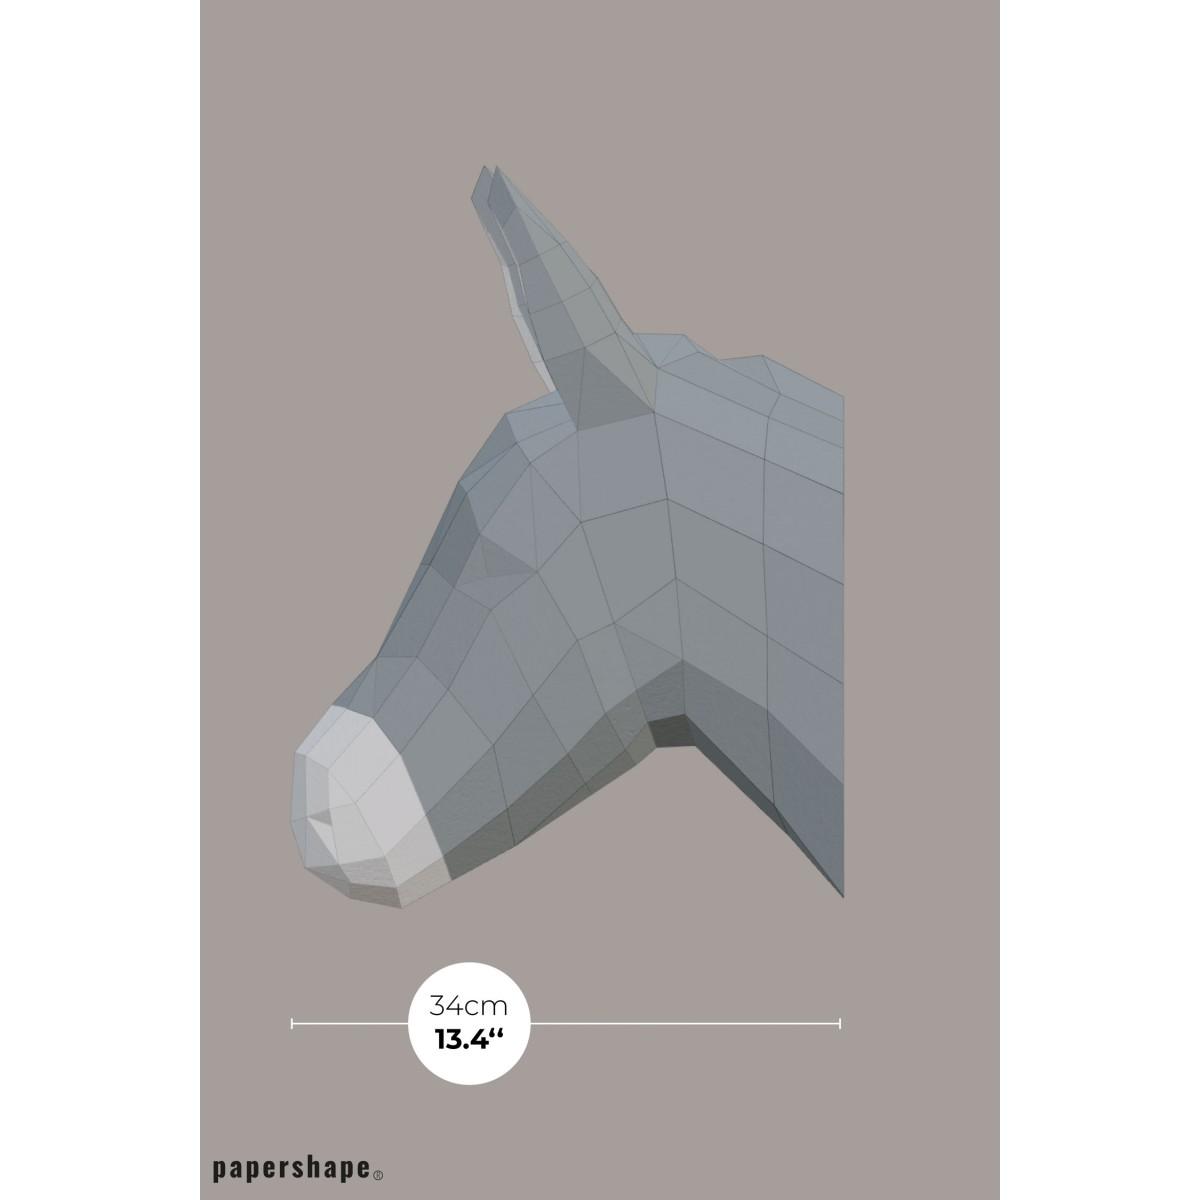 Esel - Vegane Tiertrophäe aus Papier im DIY Kit